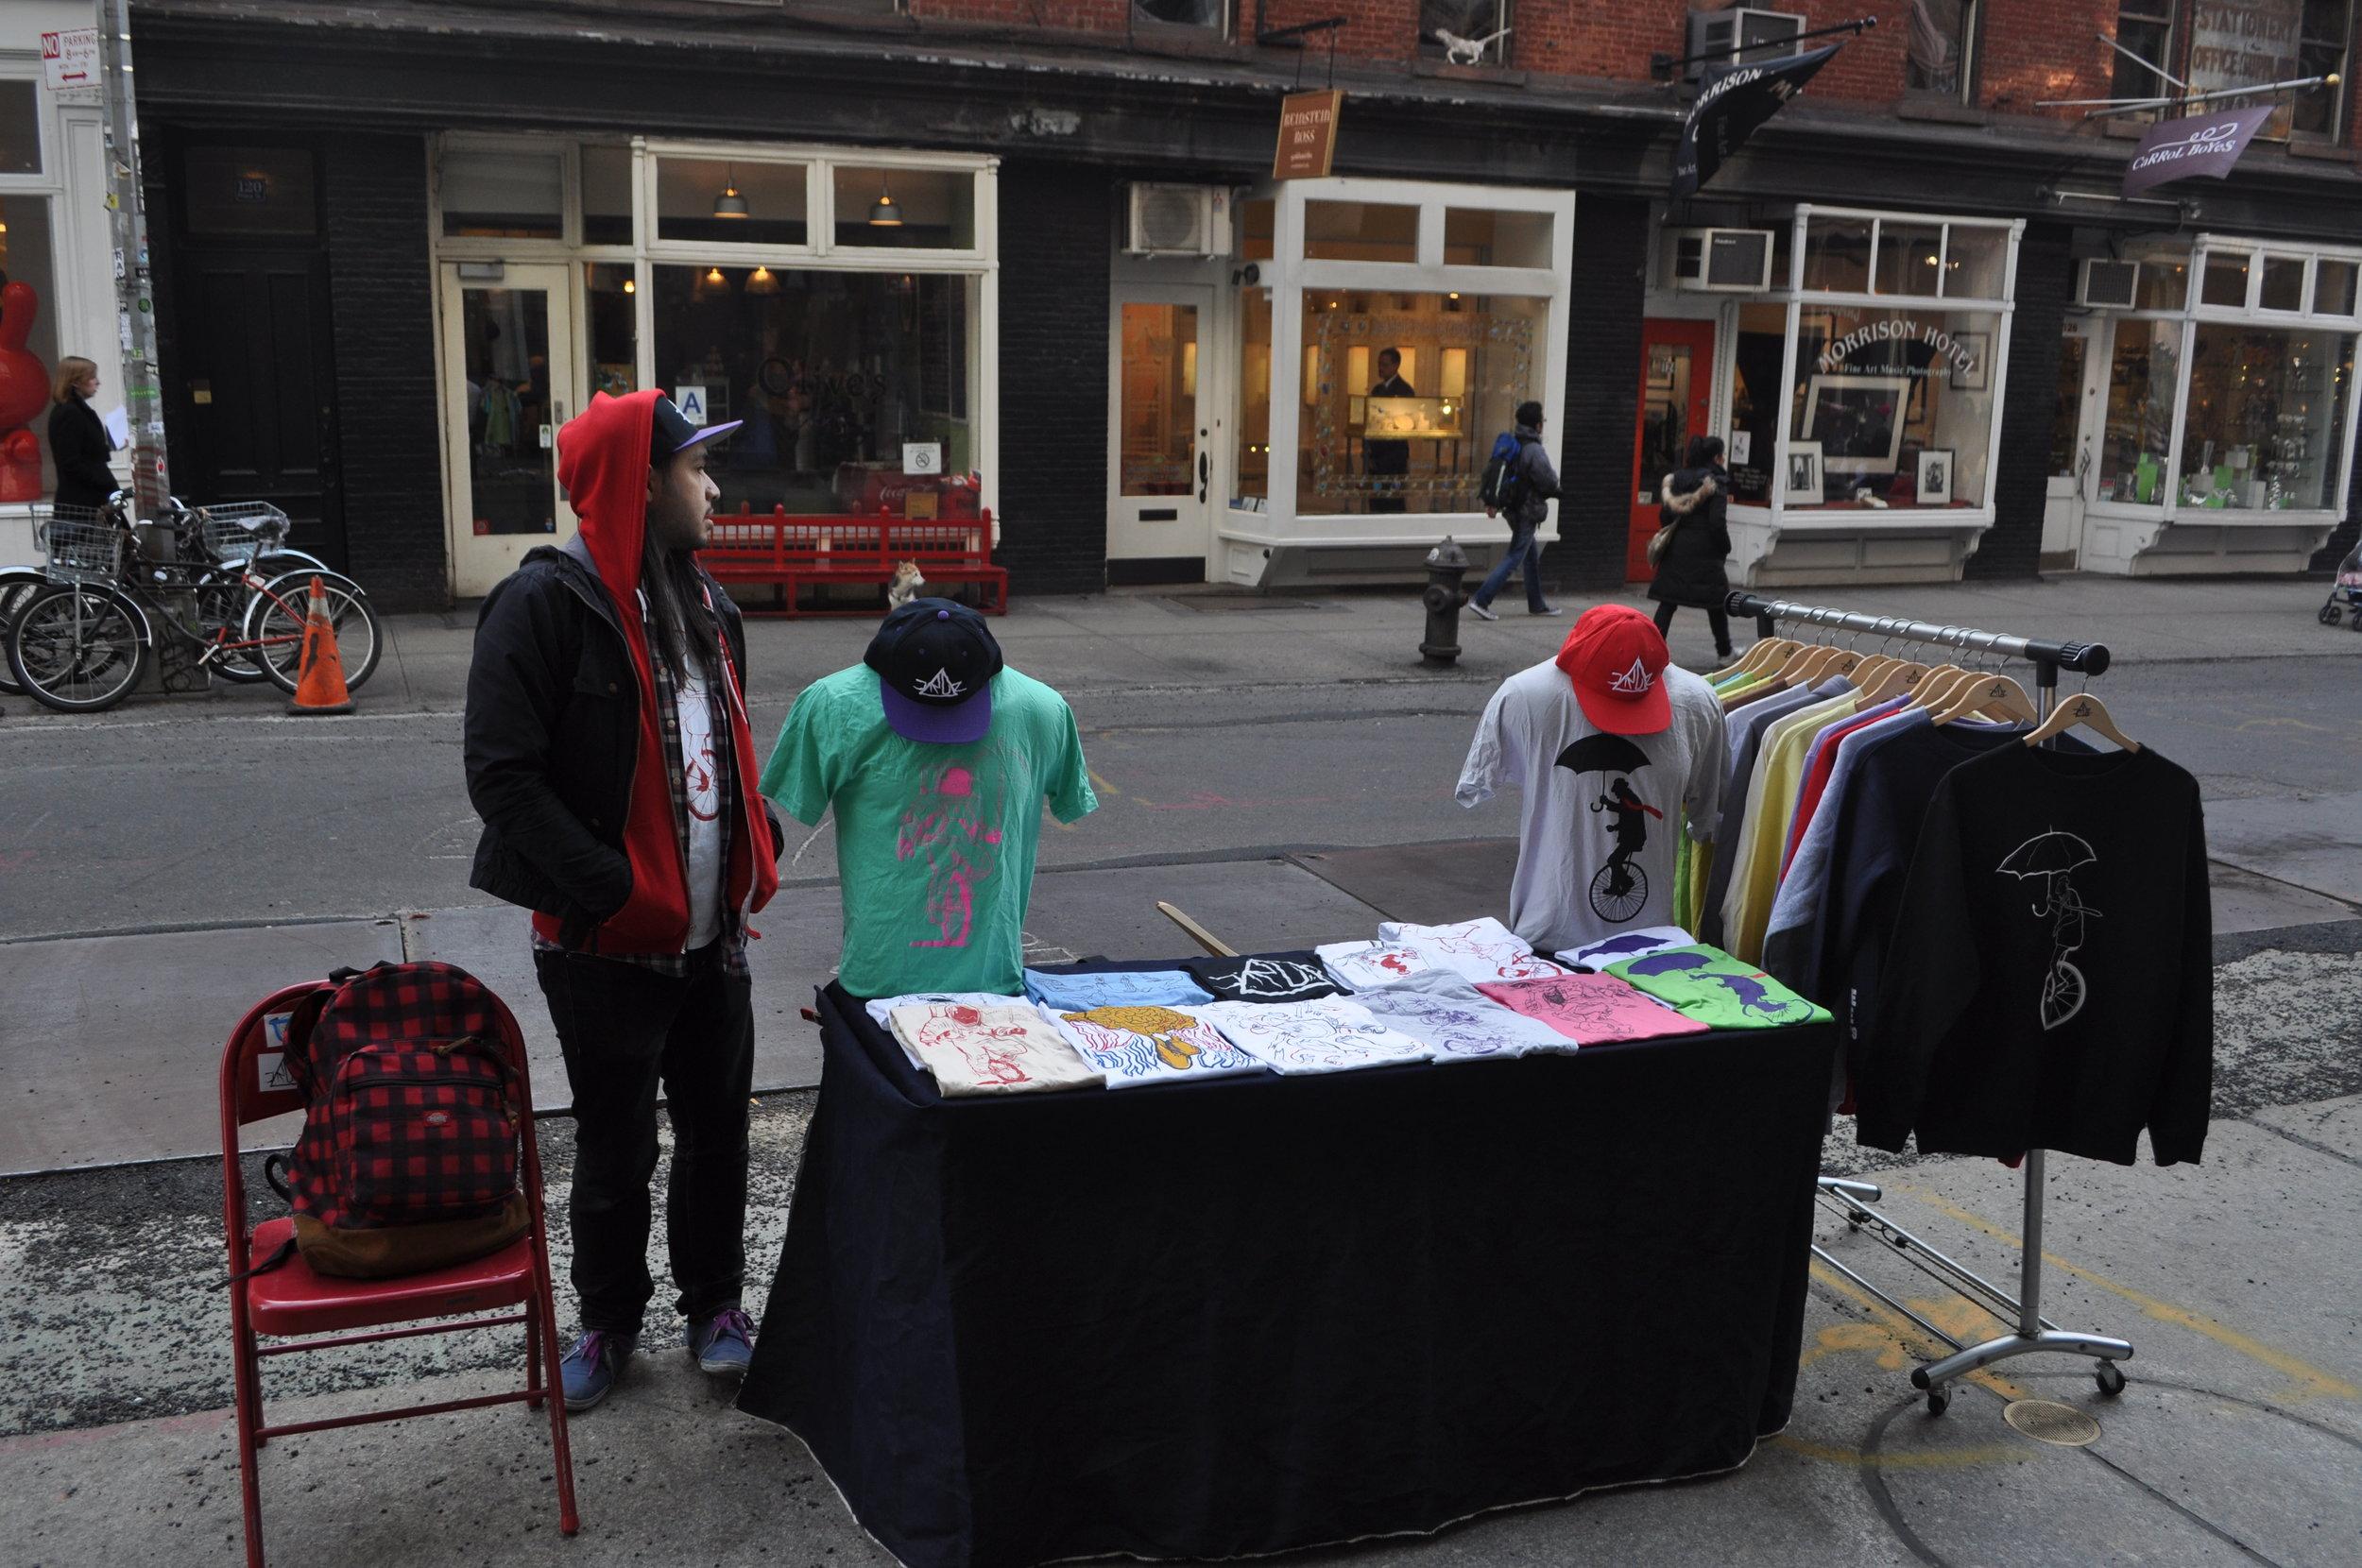 Prince St. Soho NY 2012 | Selling my t-shirts on the street.